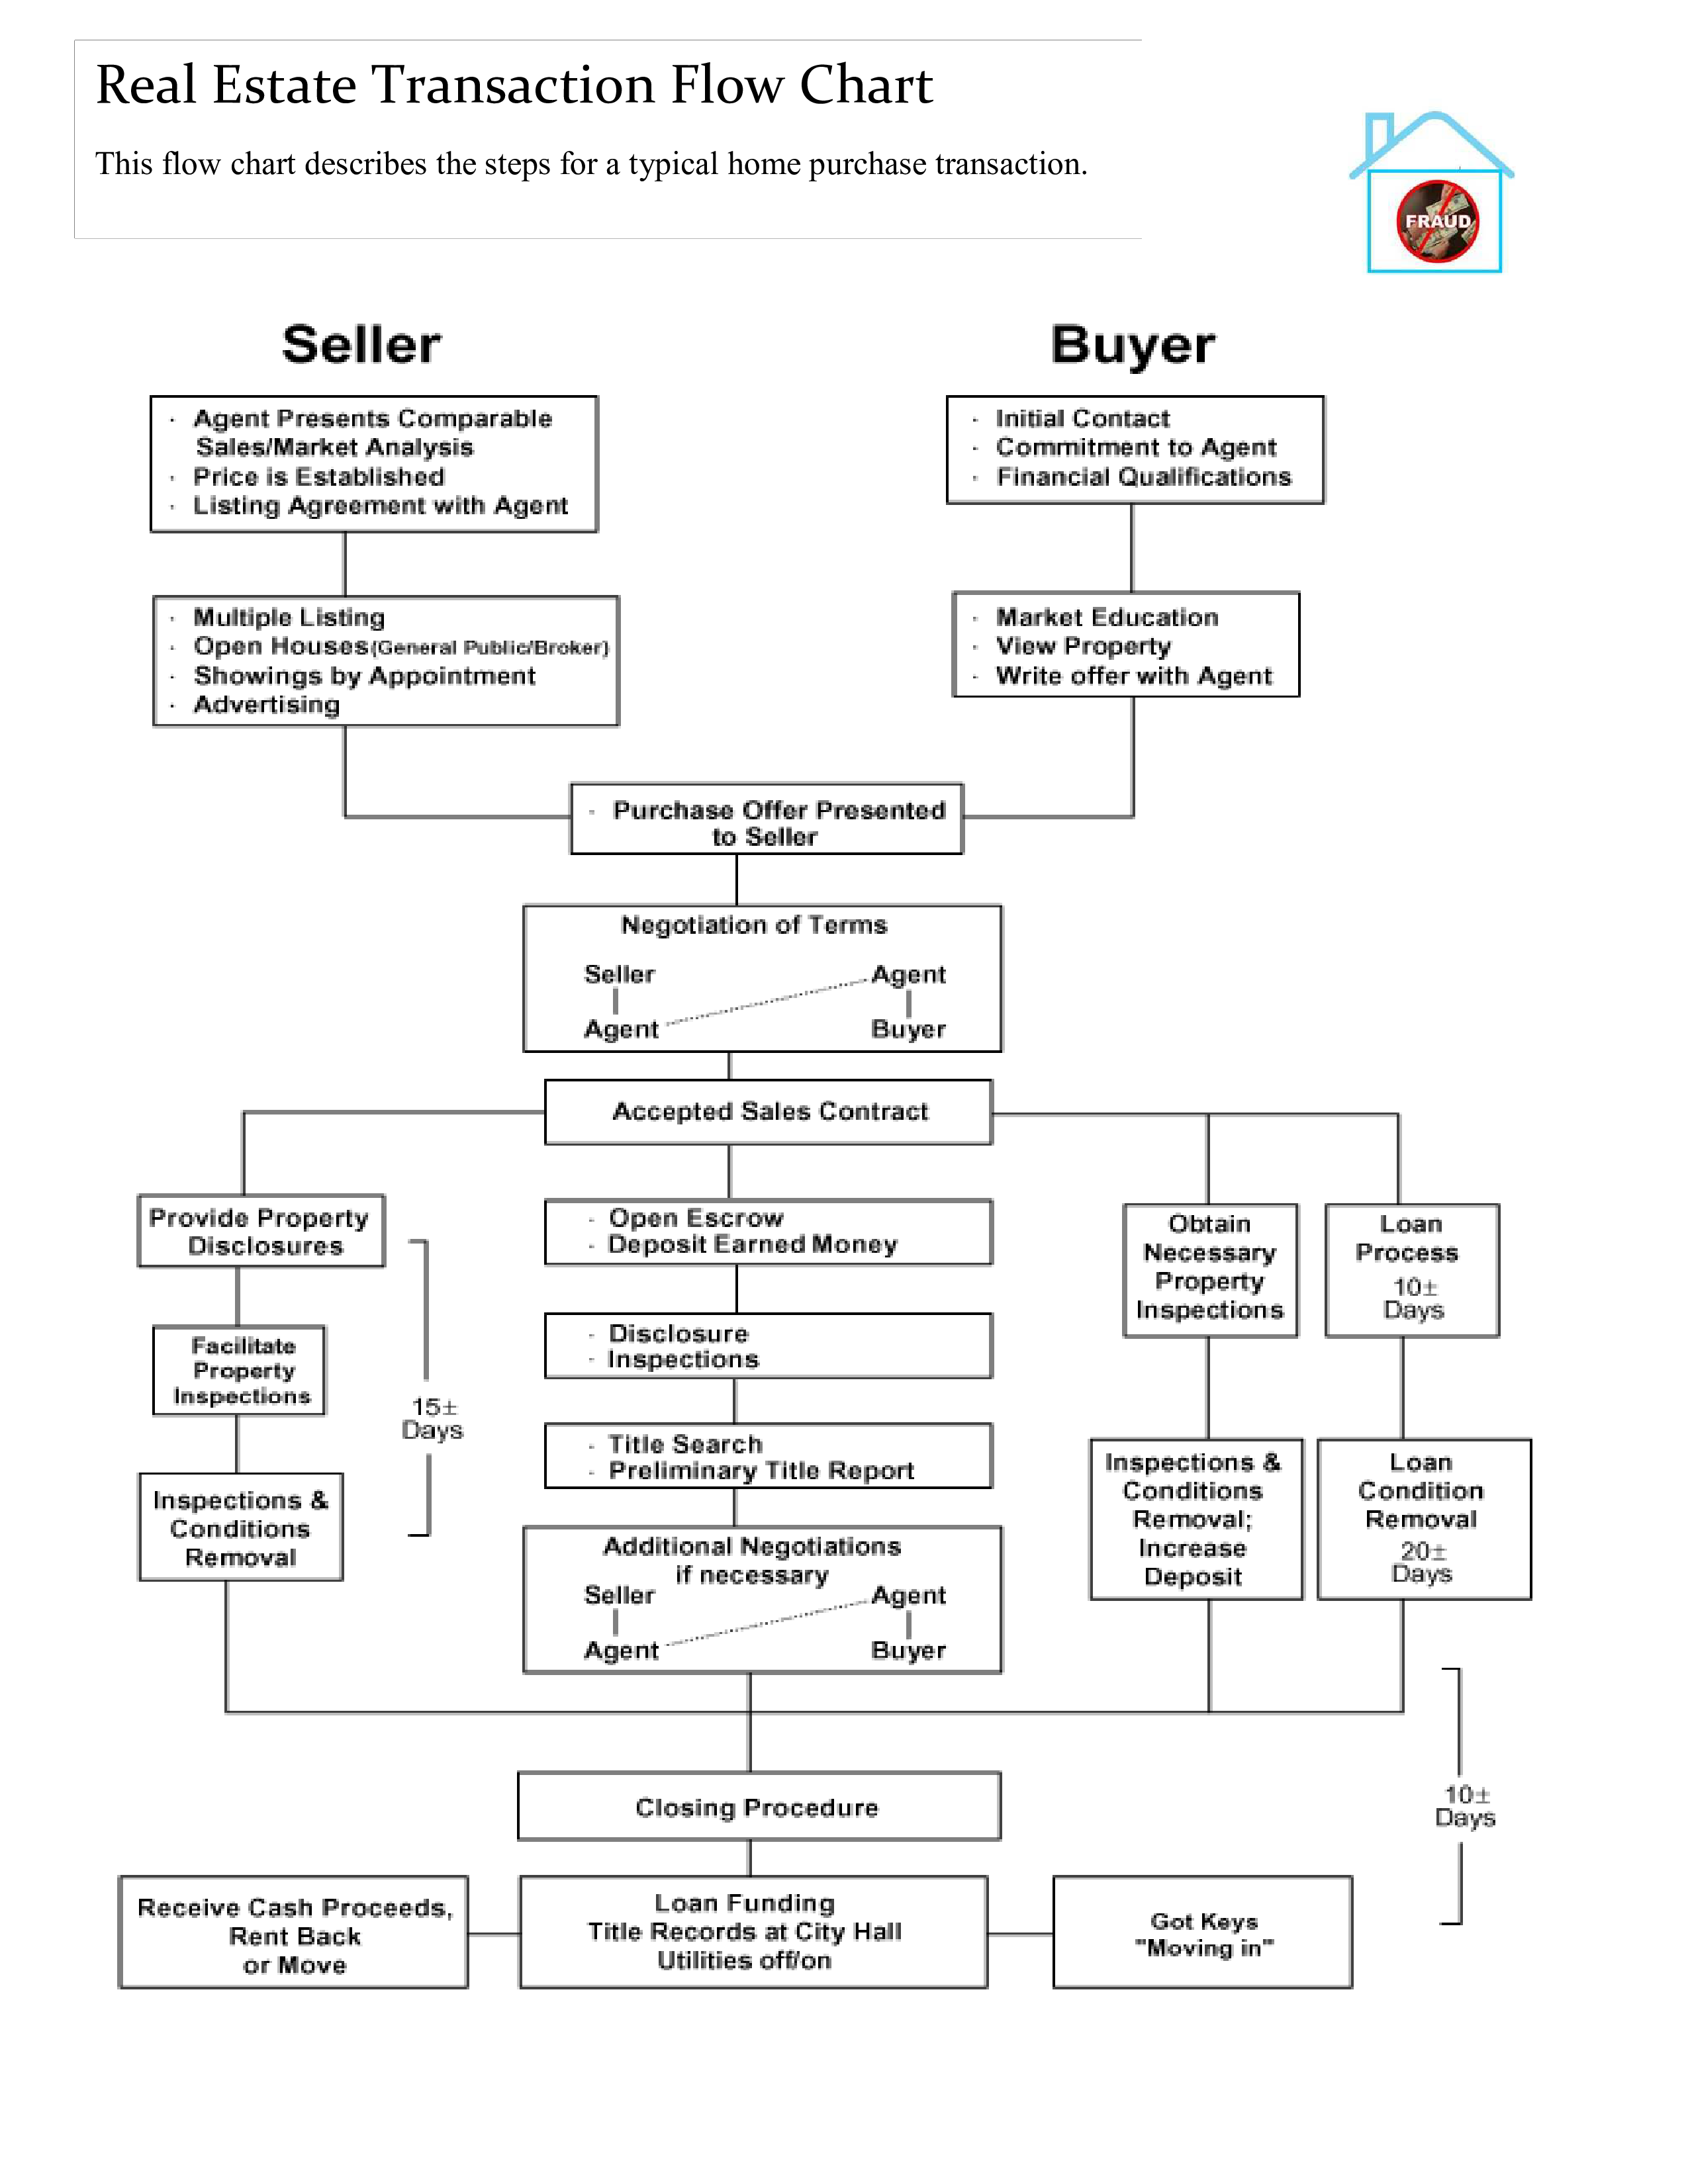 Free Real Estate Sales Flowchart Templates At Allbusinesstemplatescom - Sales flow chart template